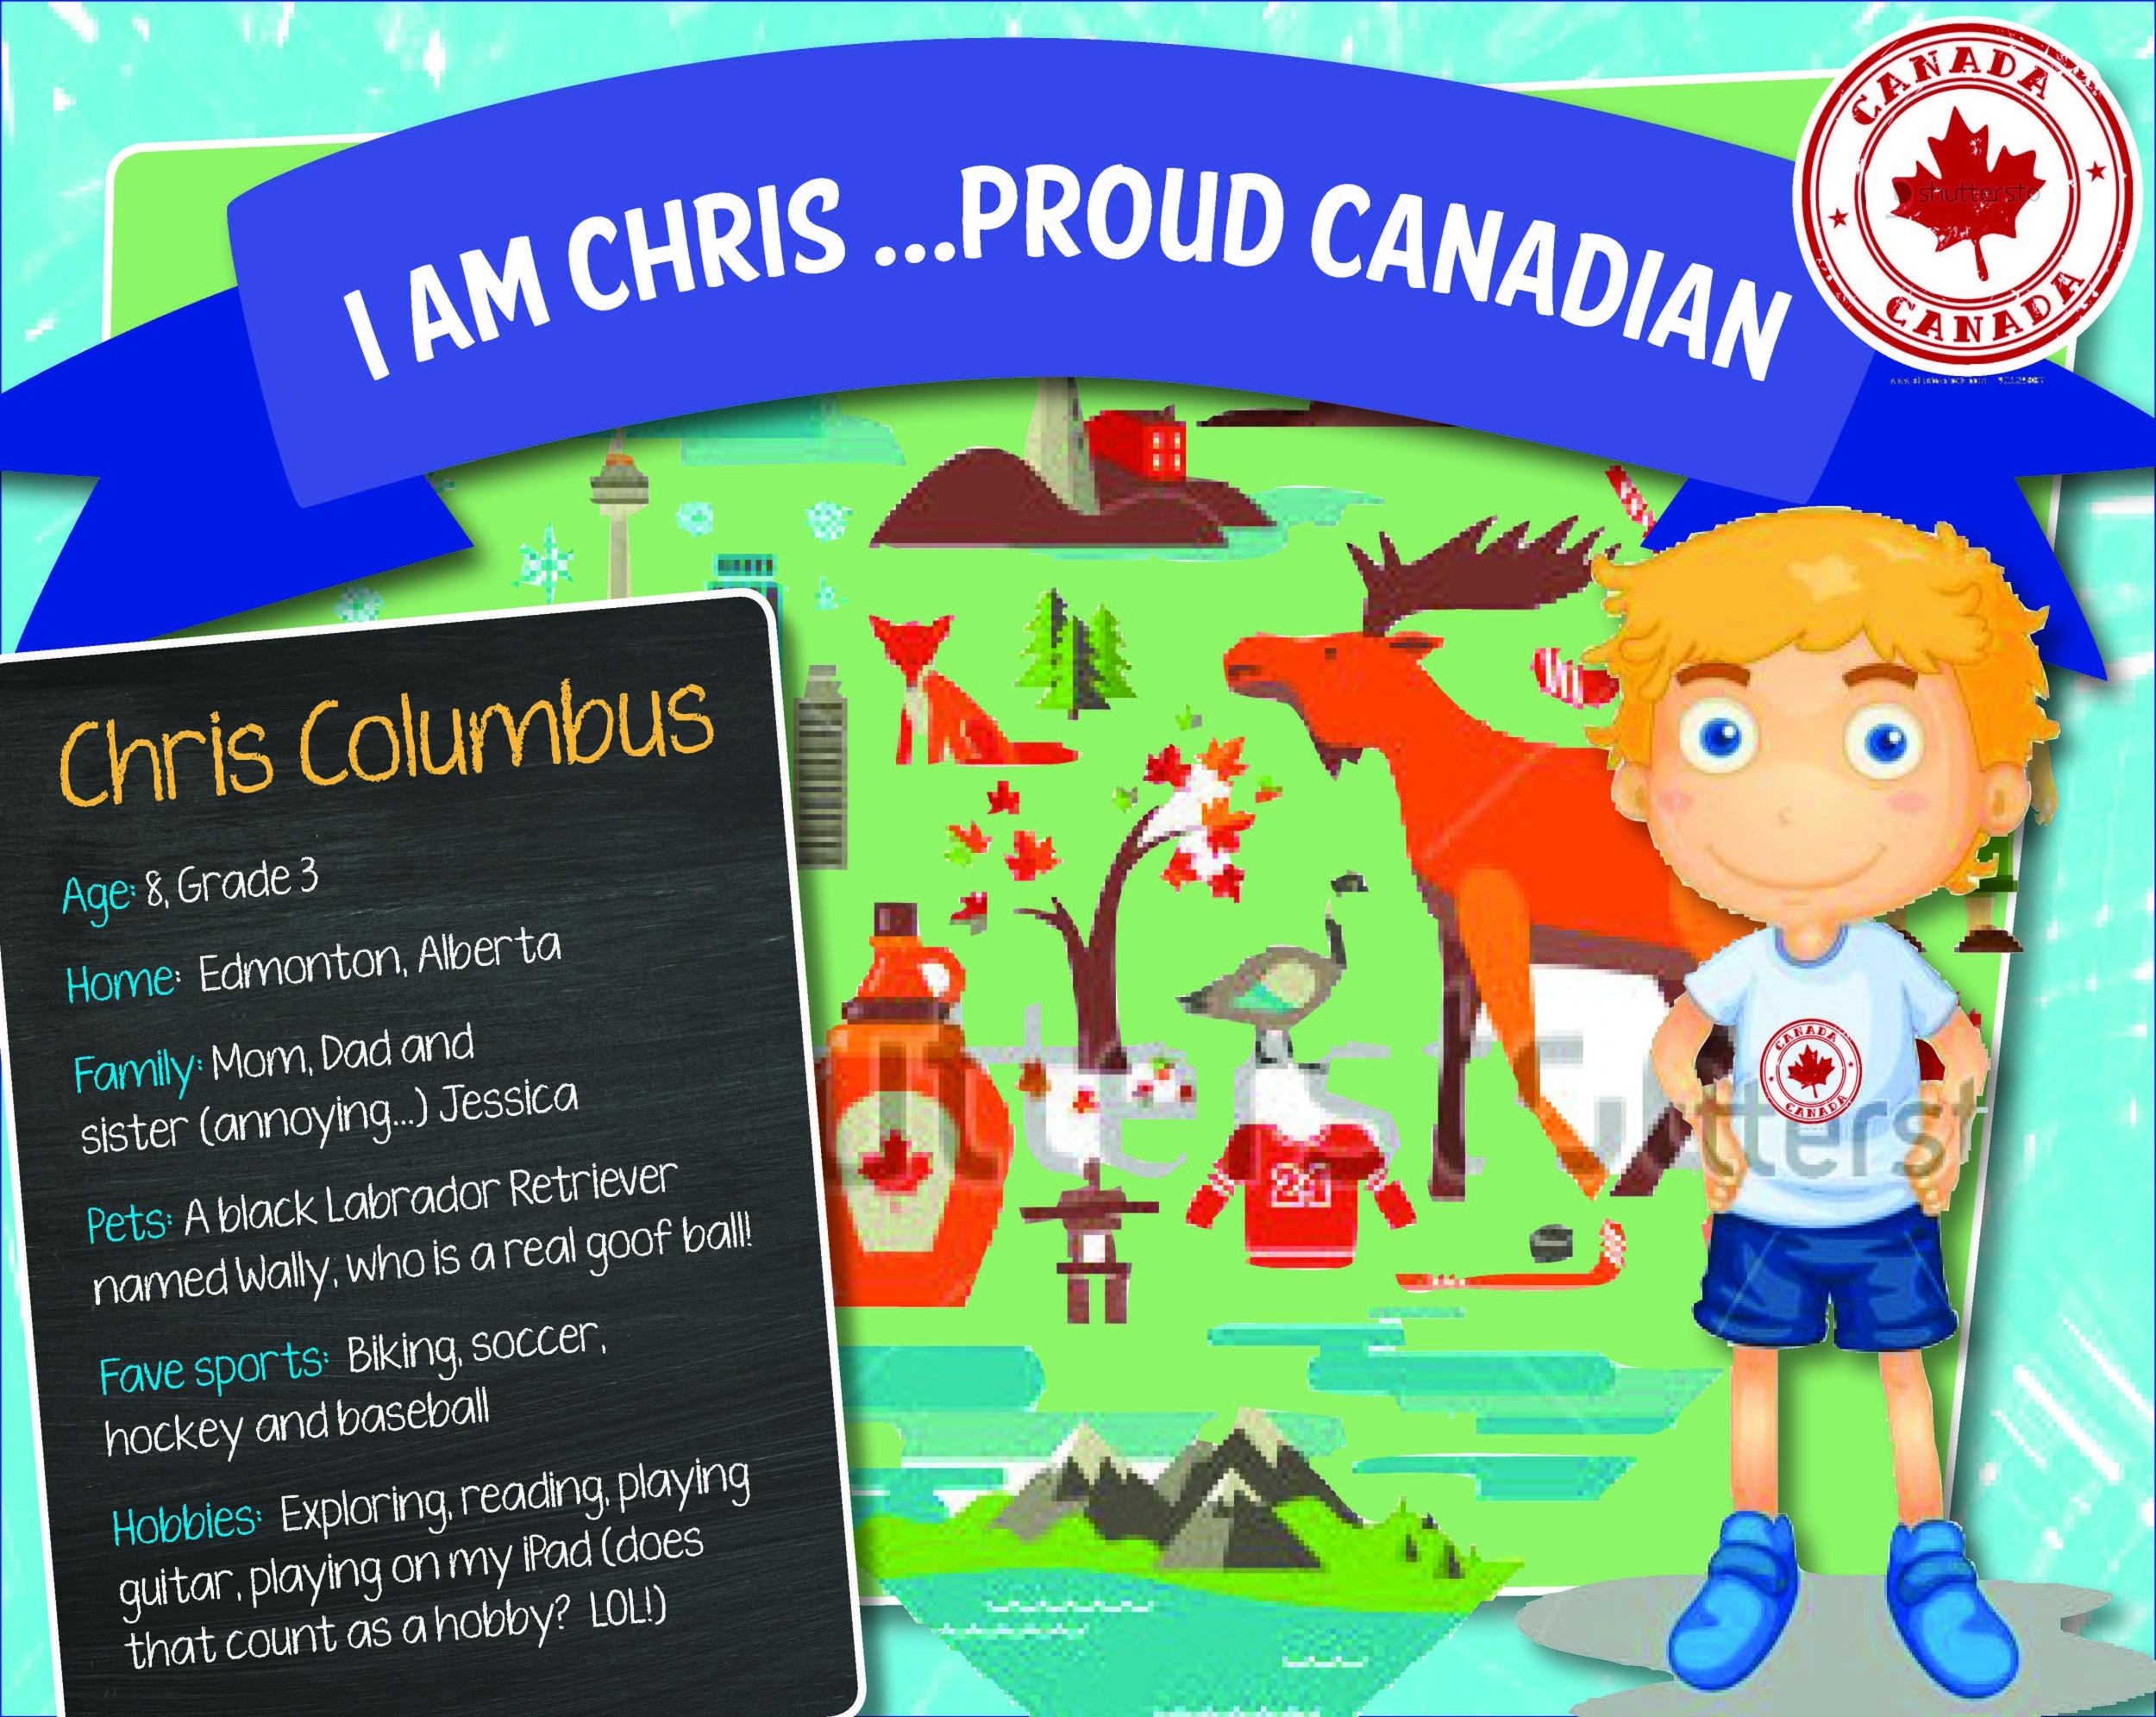 I am Chris...Proud Canadian